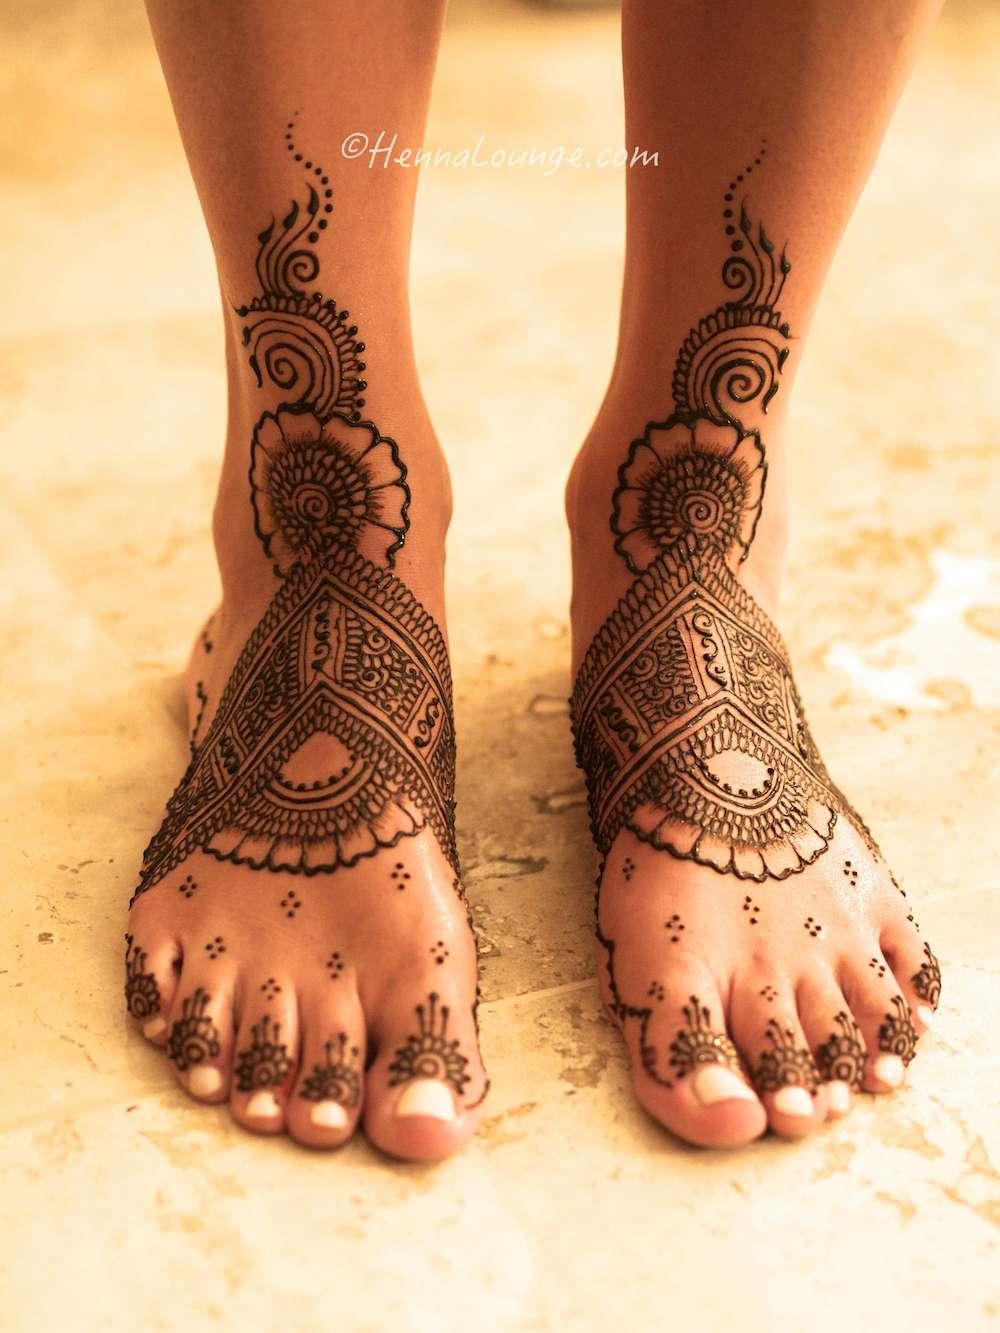 Henna at Sandos resort, without sandals.